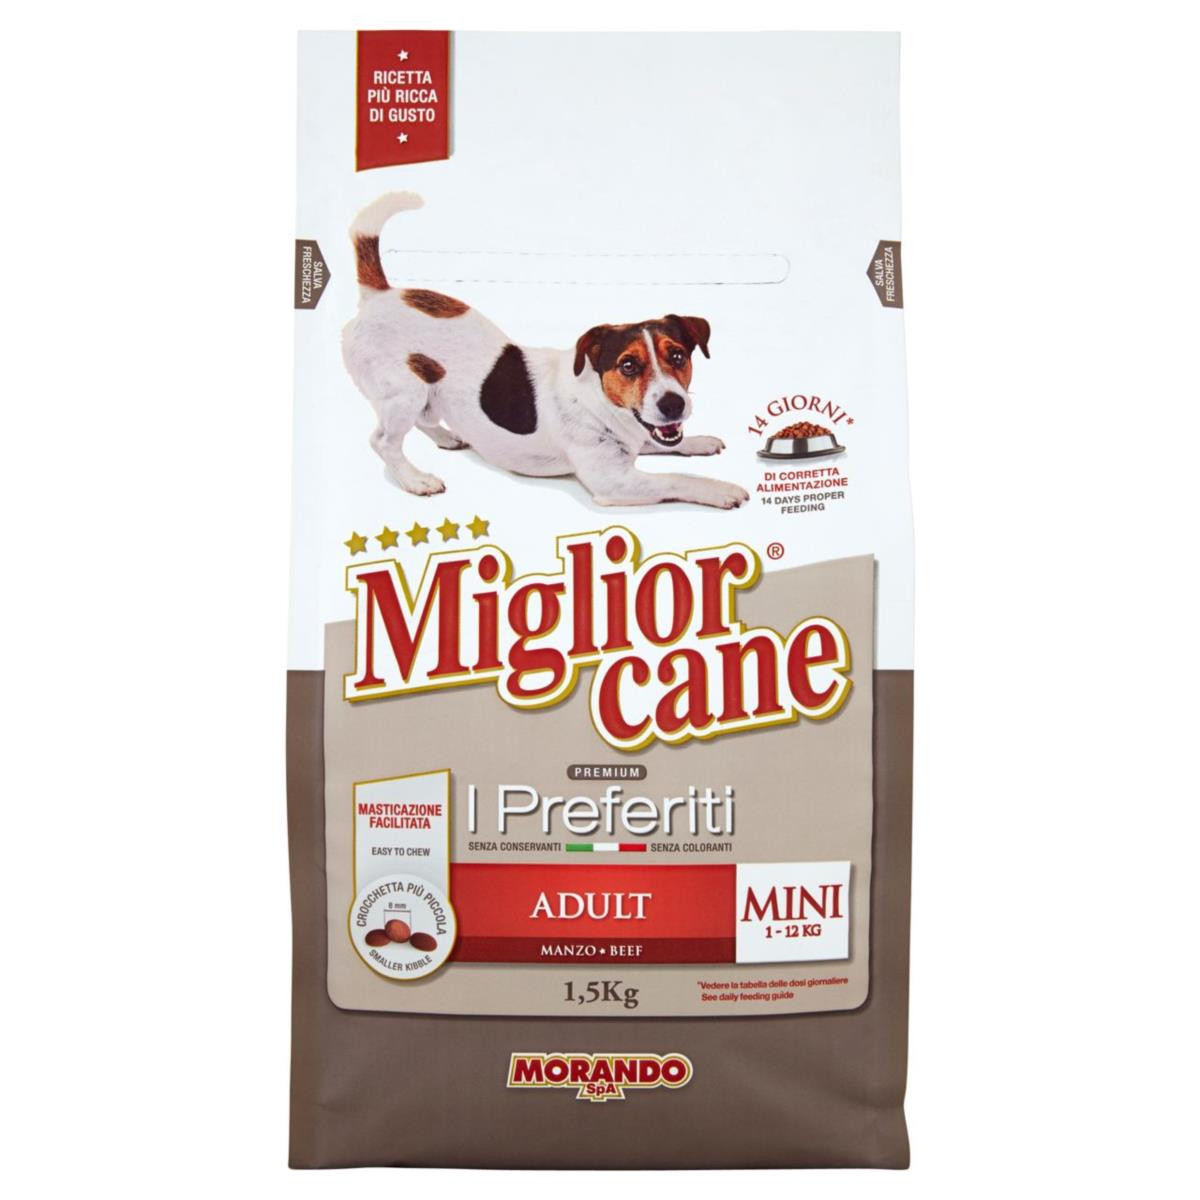 Morando Miglior Cane Adult 1.5kg [Thịt Bò Cao Cấp]